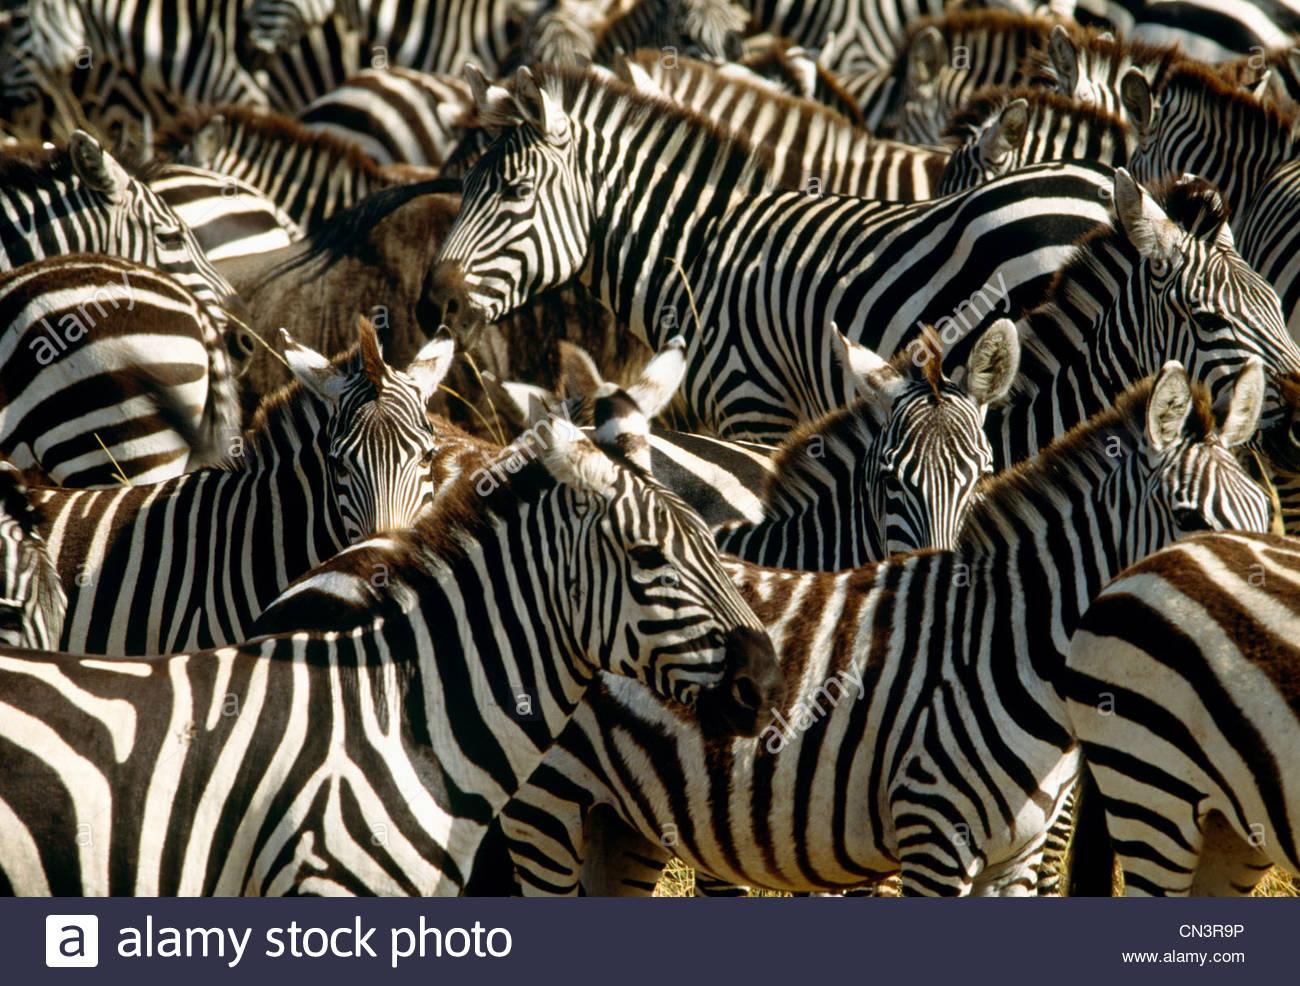 Grant's zebra mass migration, Masai Mara National Reserve, Kenya - Stock Image